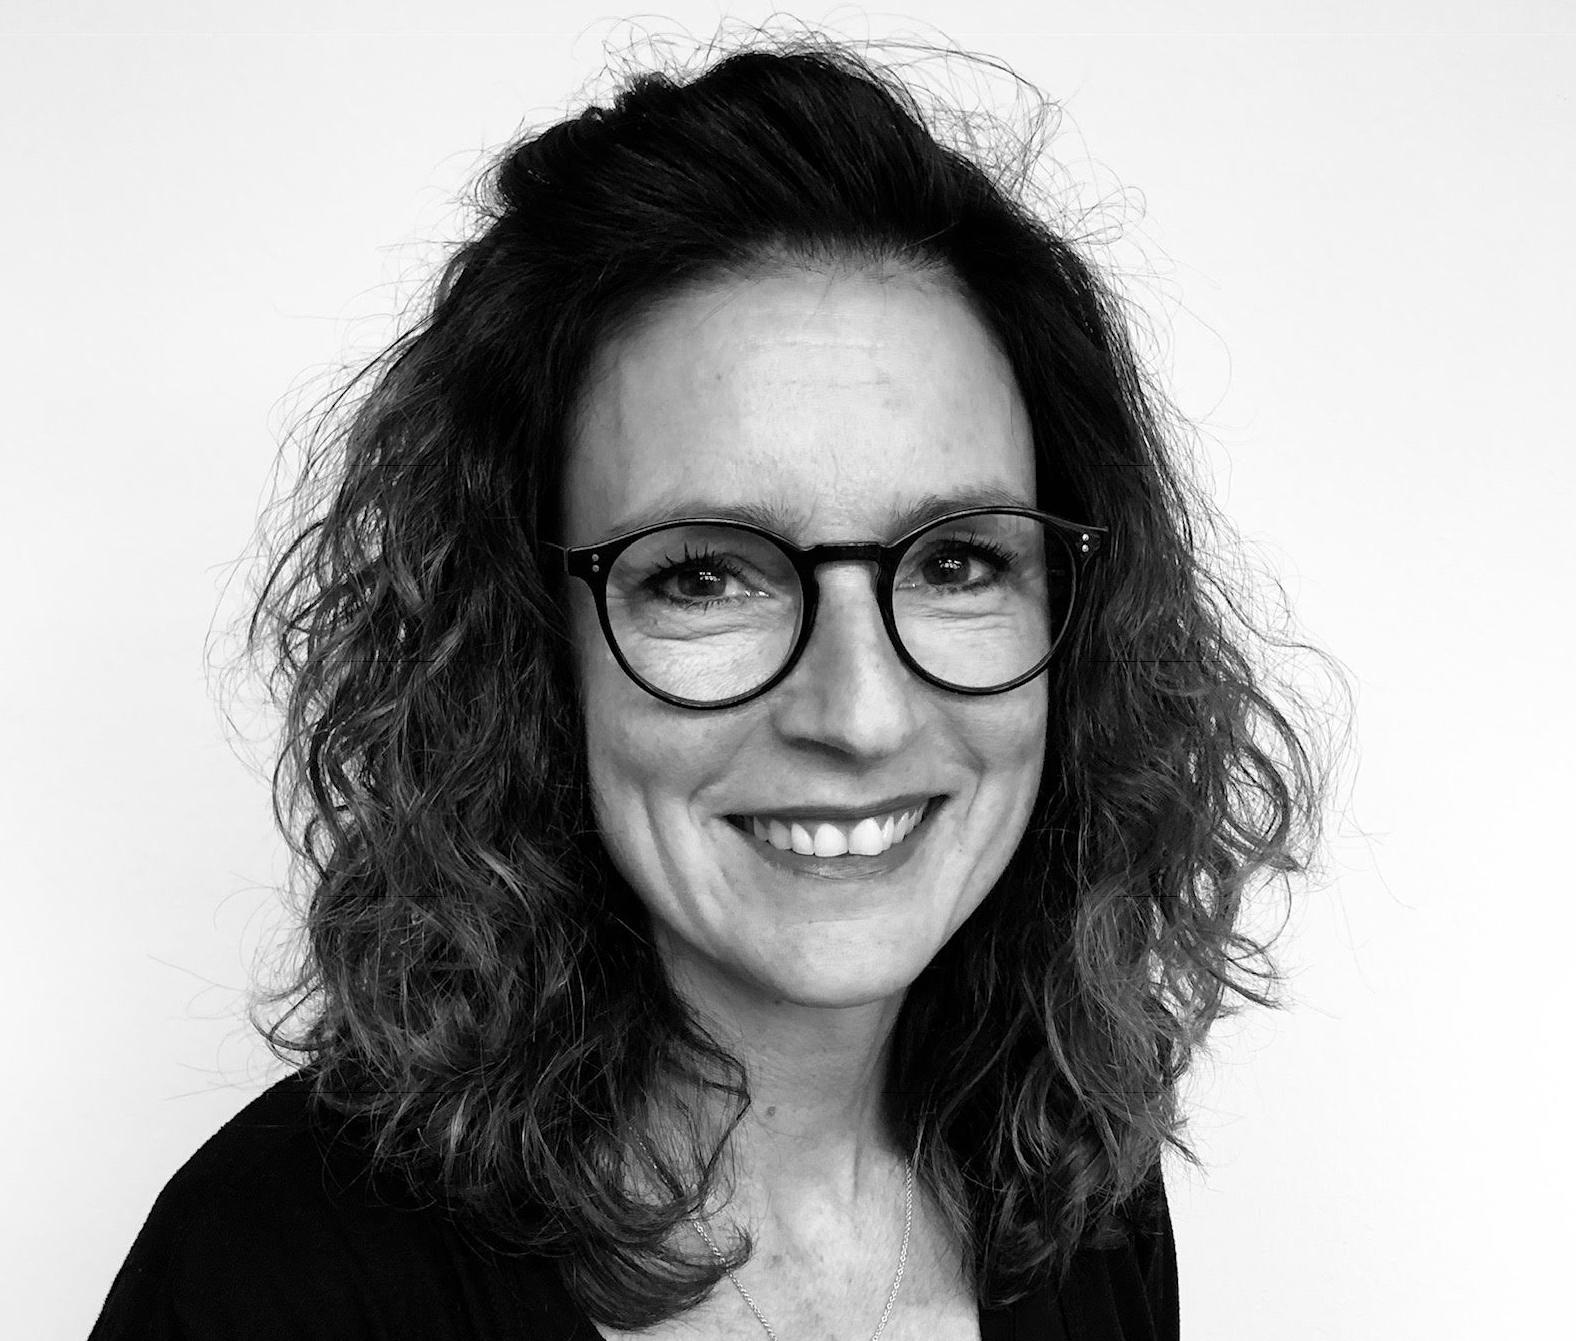 Denise-Savoldelli-Porträt